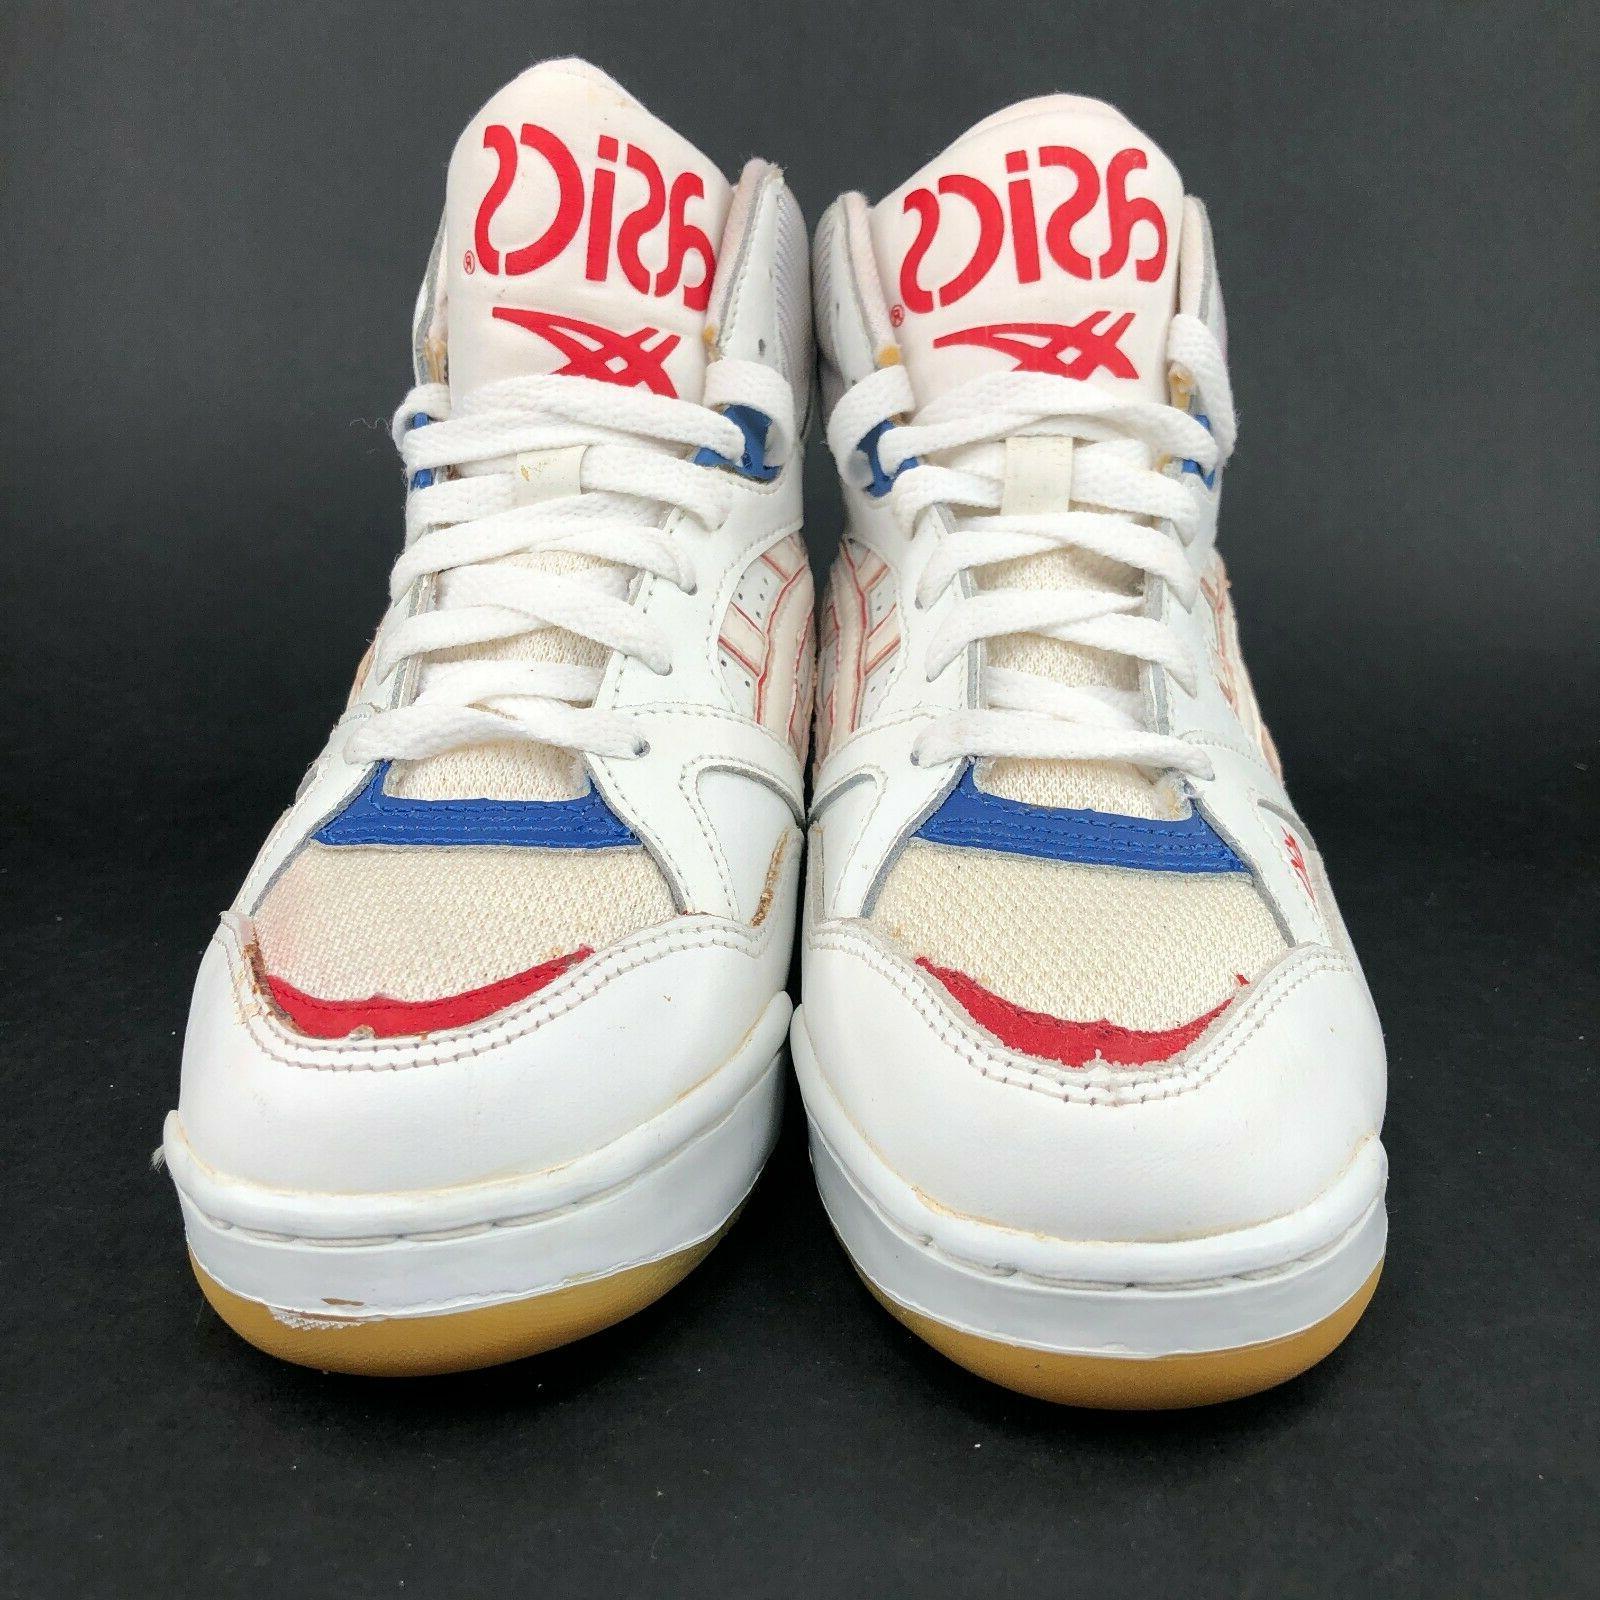 ASICS White Basketball Shoes Ups Great